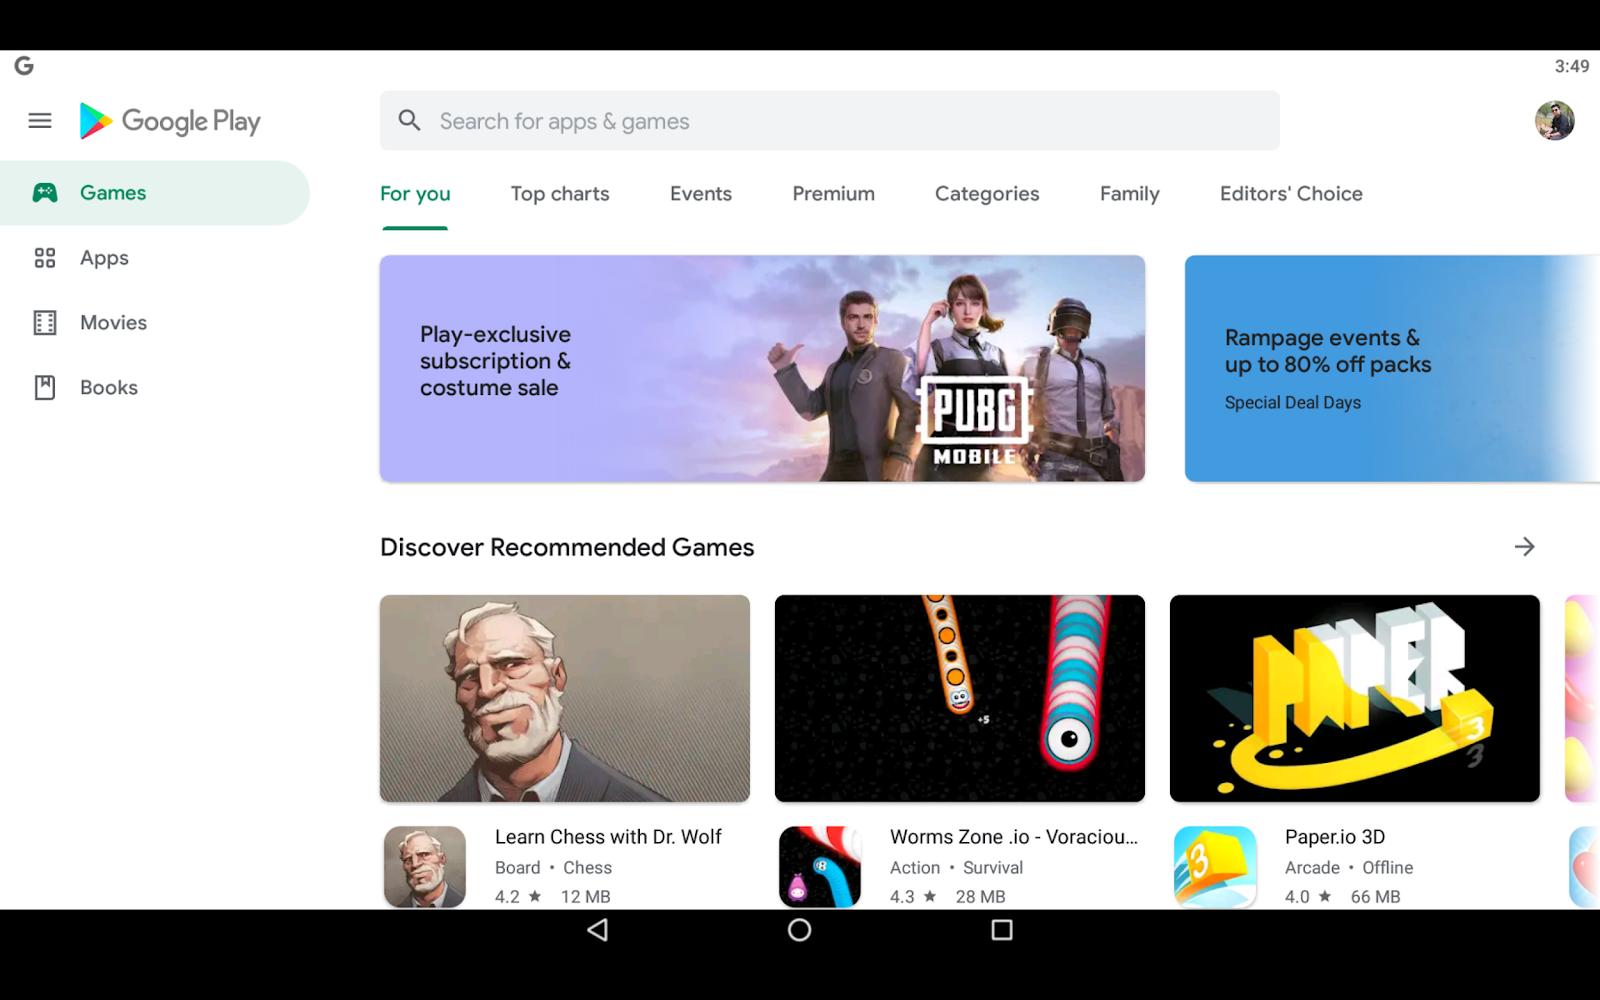 Smart News app for PC from BlueStacks